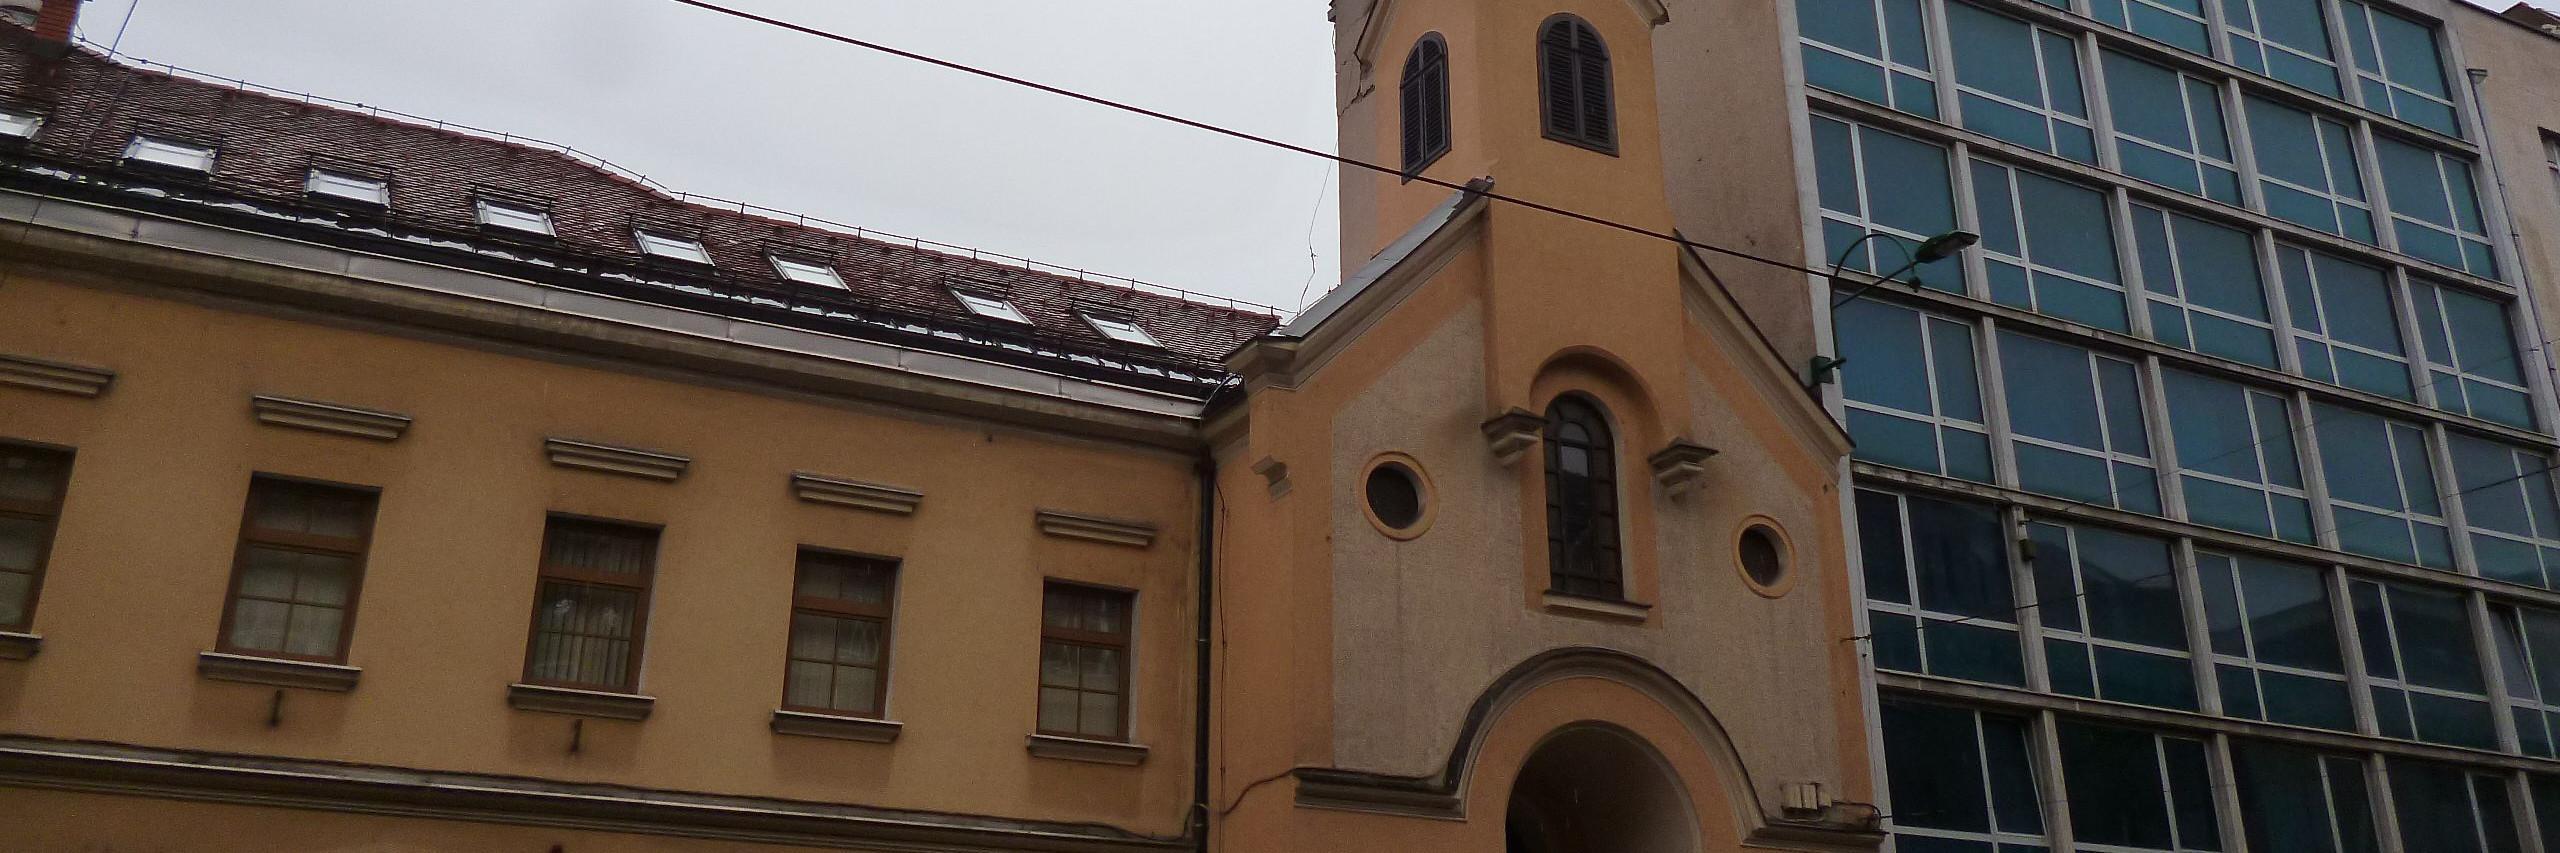 Церковь св. Винко Паульского. Фото: Елена Арсениевич, CC BY-SA 3.0